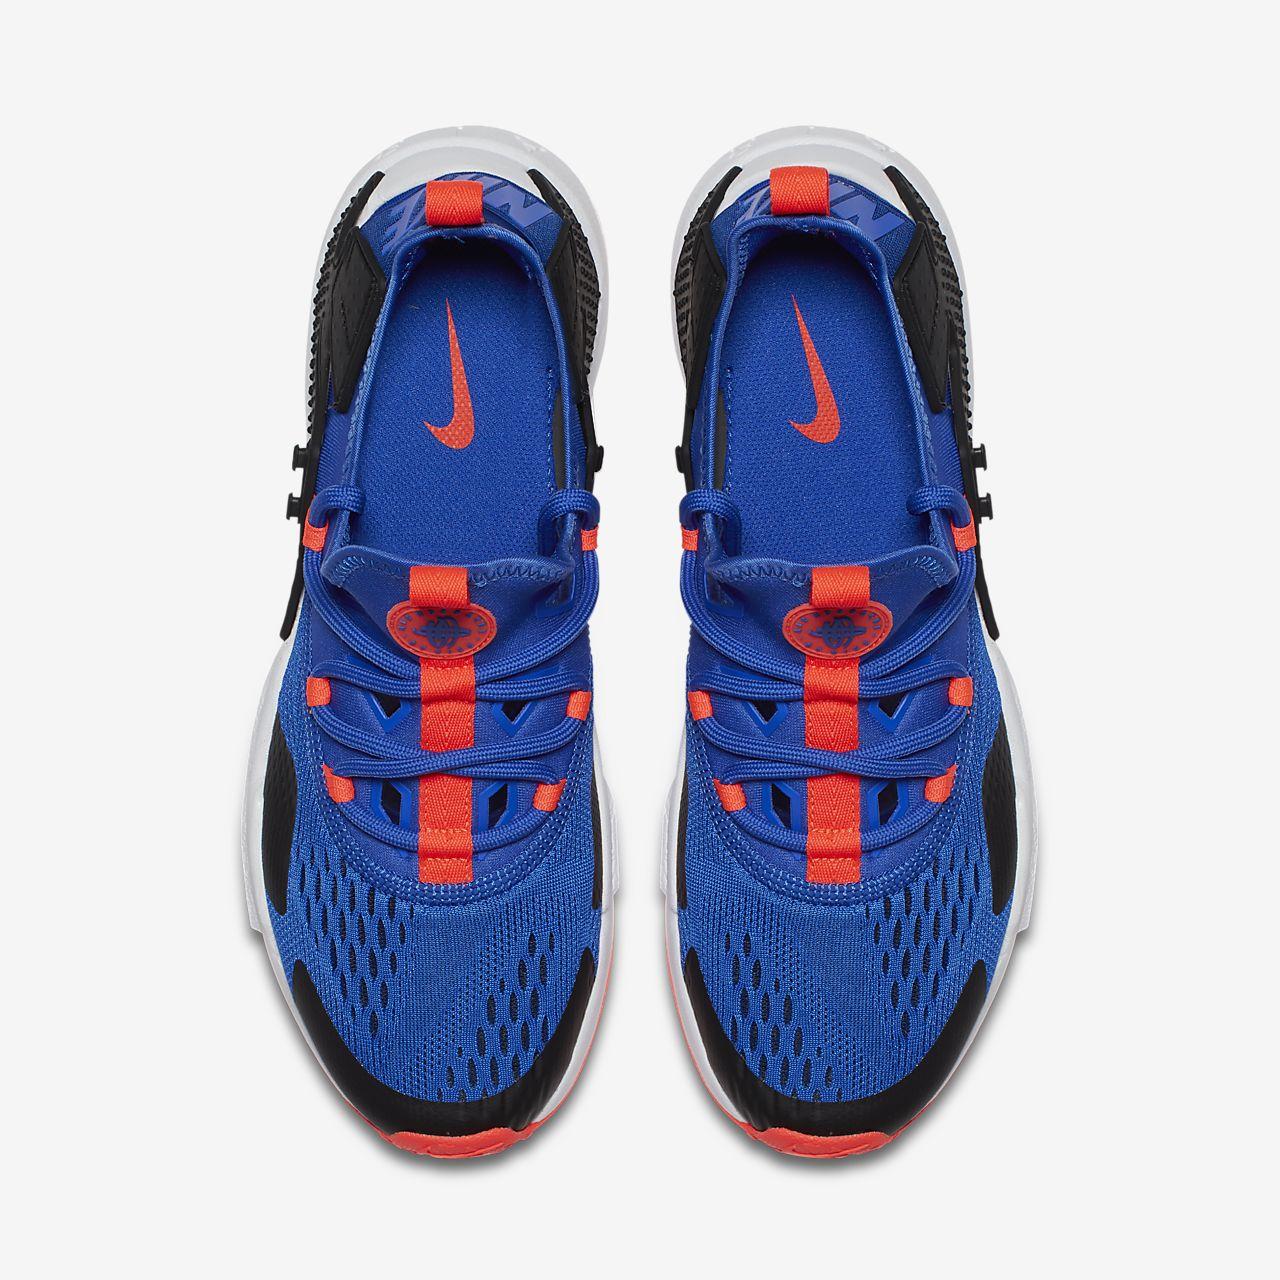 Nike Air Huarache Drift Breathe Racer Blue/ Racer Blue-Black Venta Rebajar Nuevo KmxEqhze